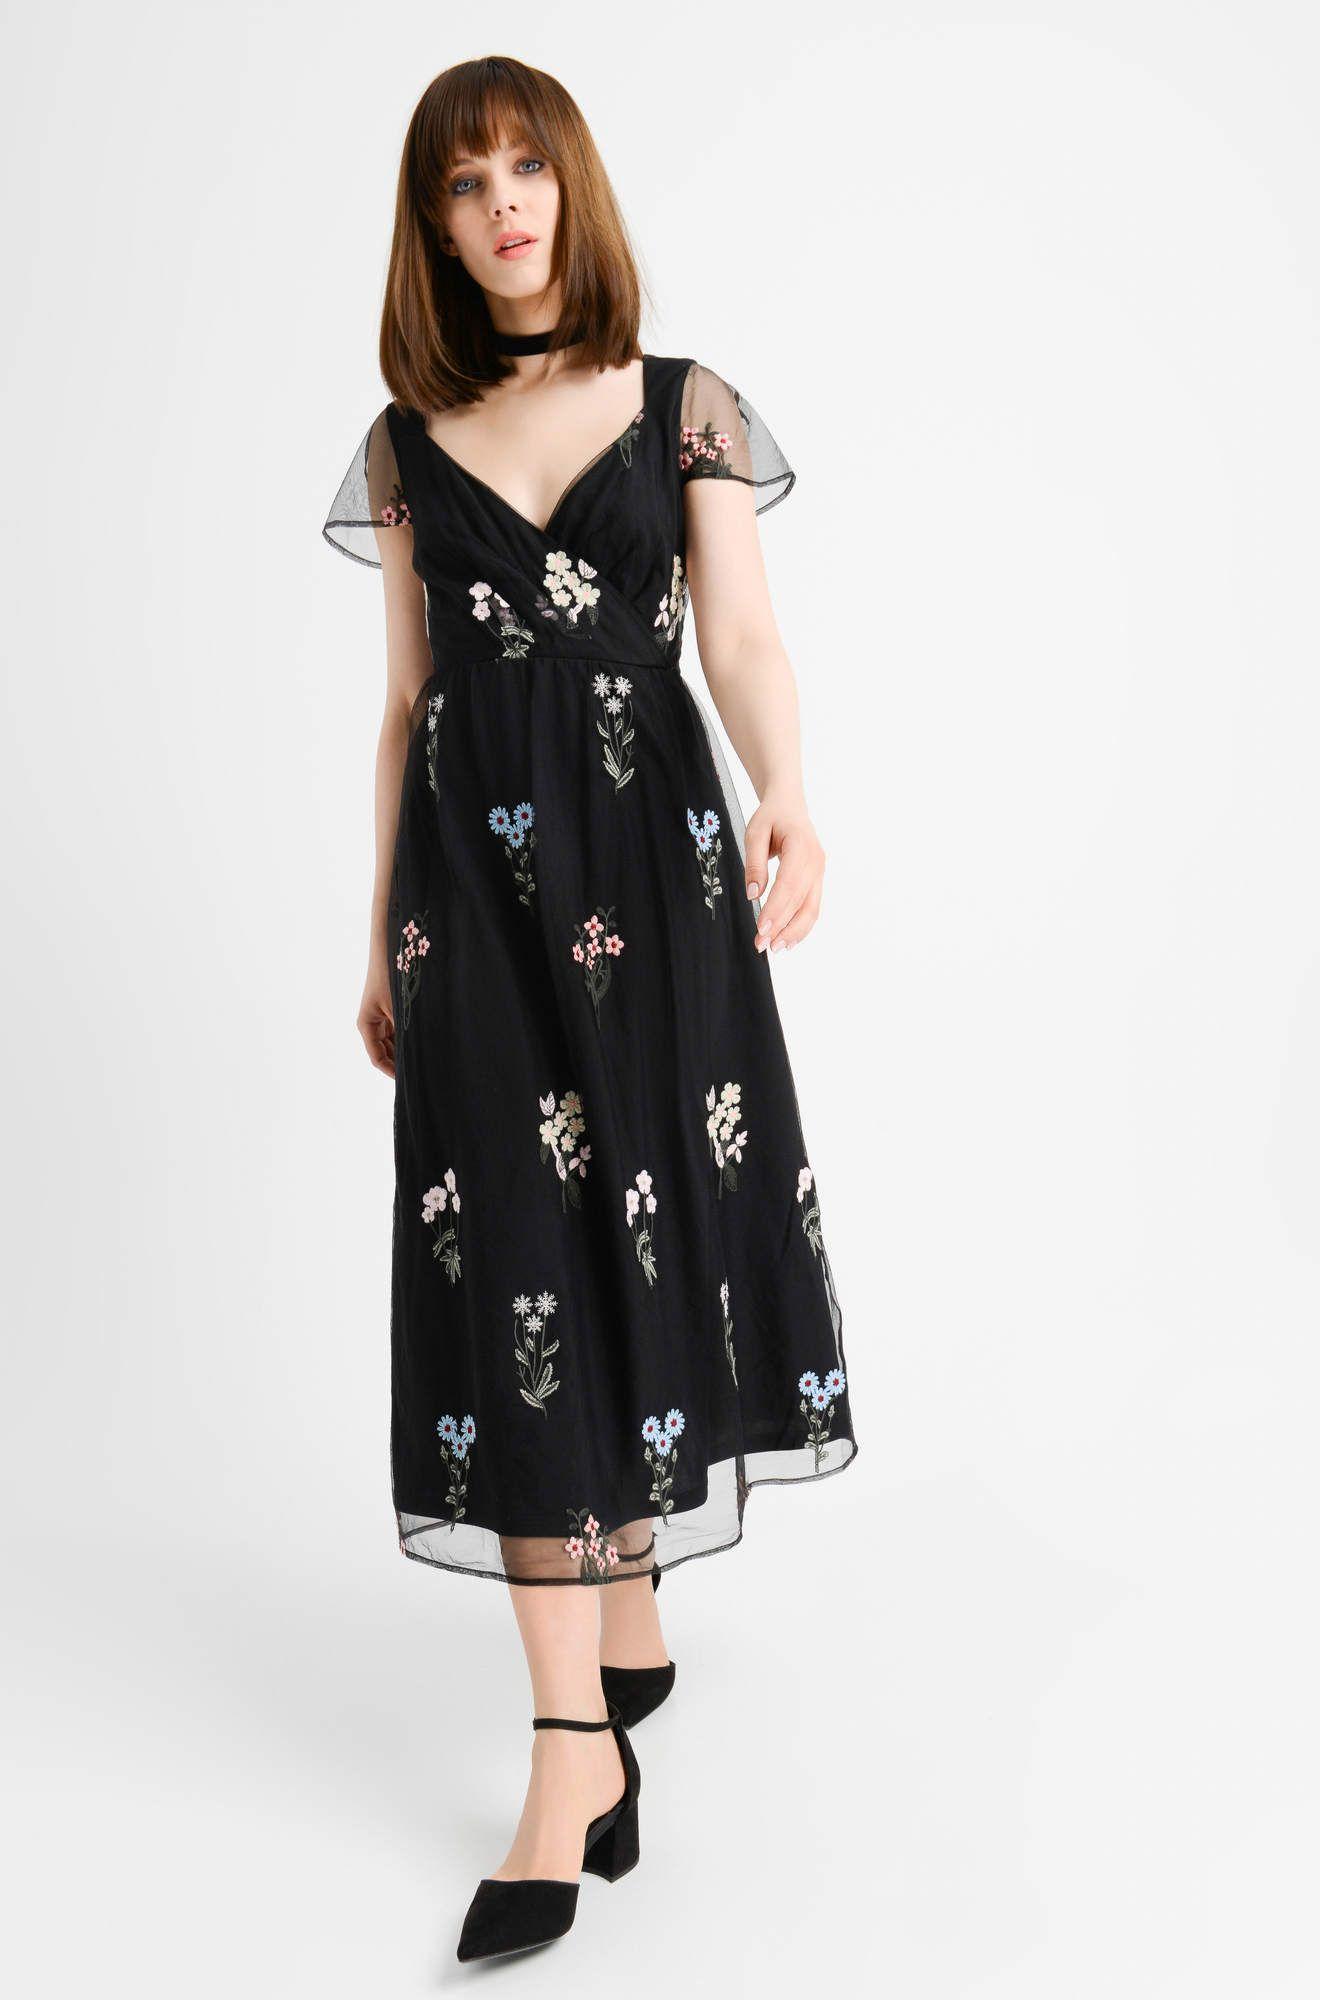 Sukienka Midi W Kwiaty Orsay Fashion Outfits Dresses Cold Shoulder Dress